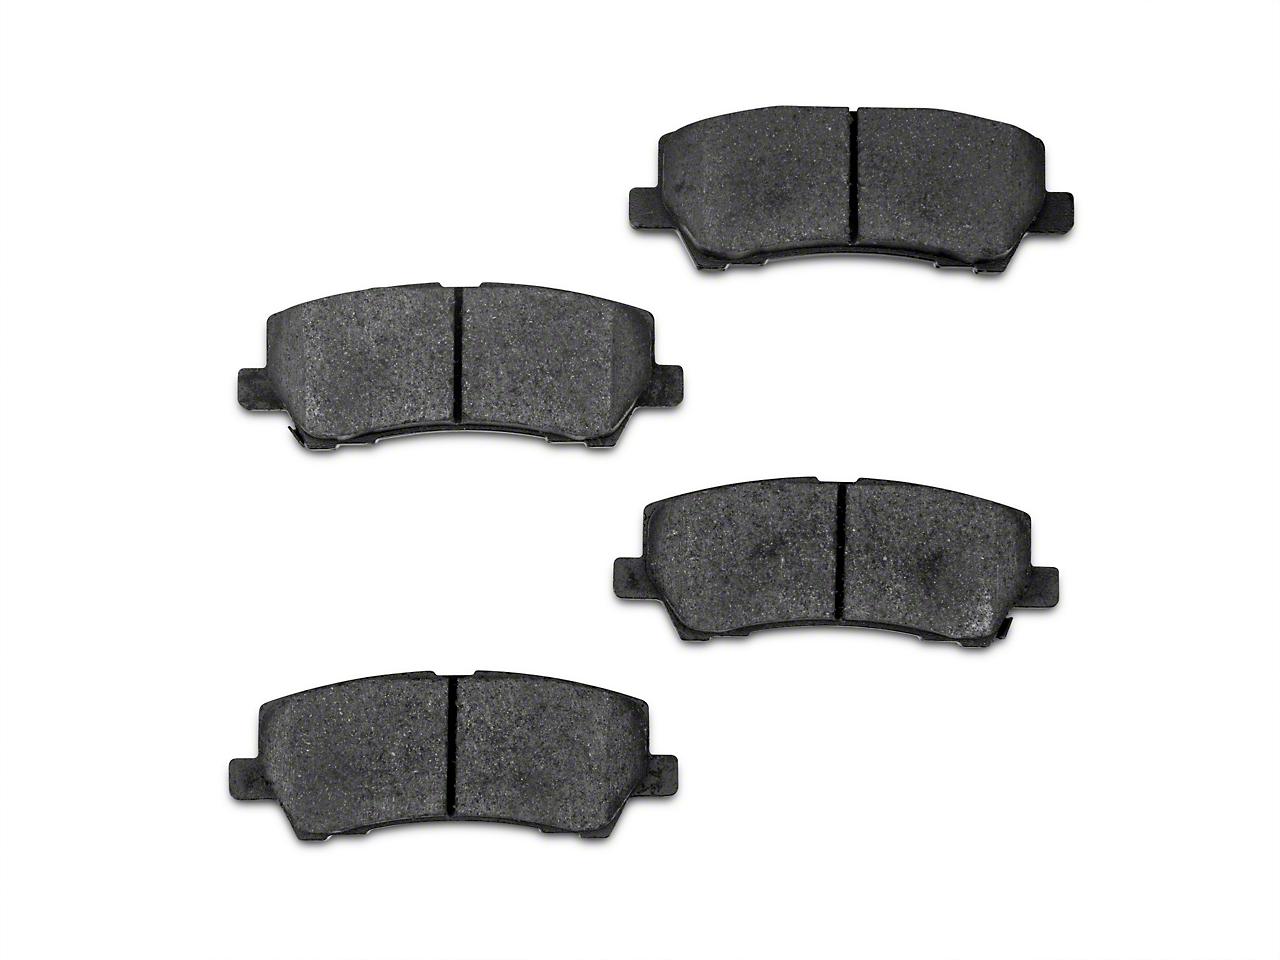 Stillen Metal Matrix Brake Pads - Rear Pair (15-17 GT, V6, EcoBoost)